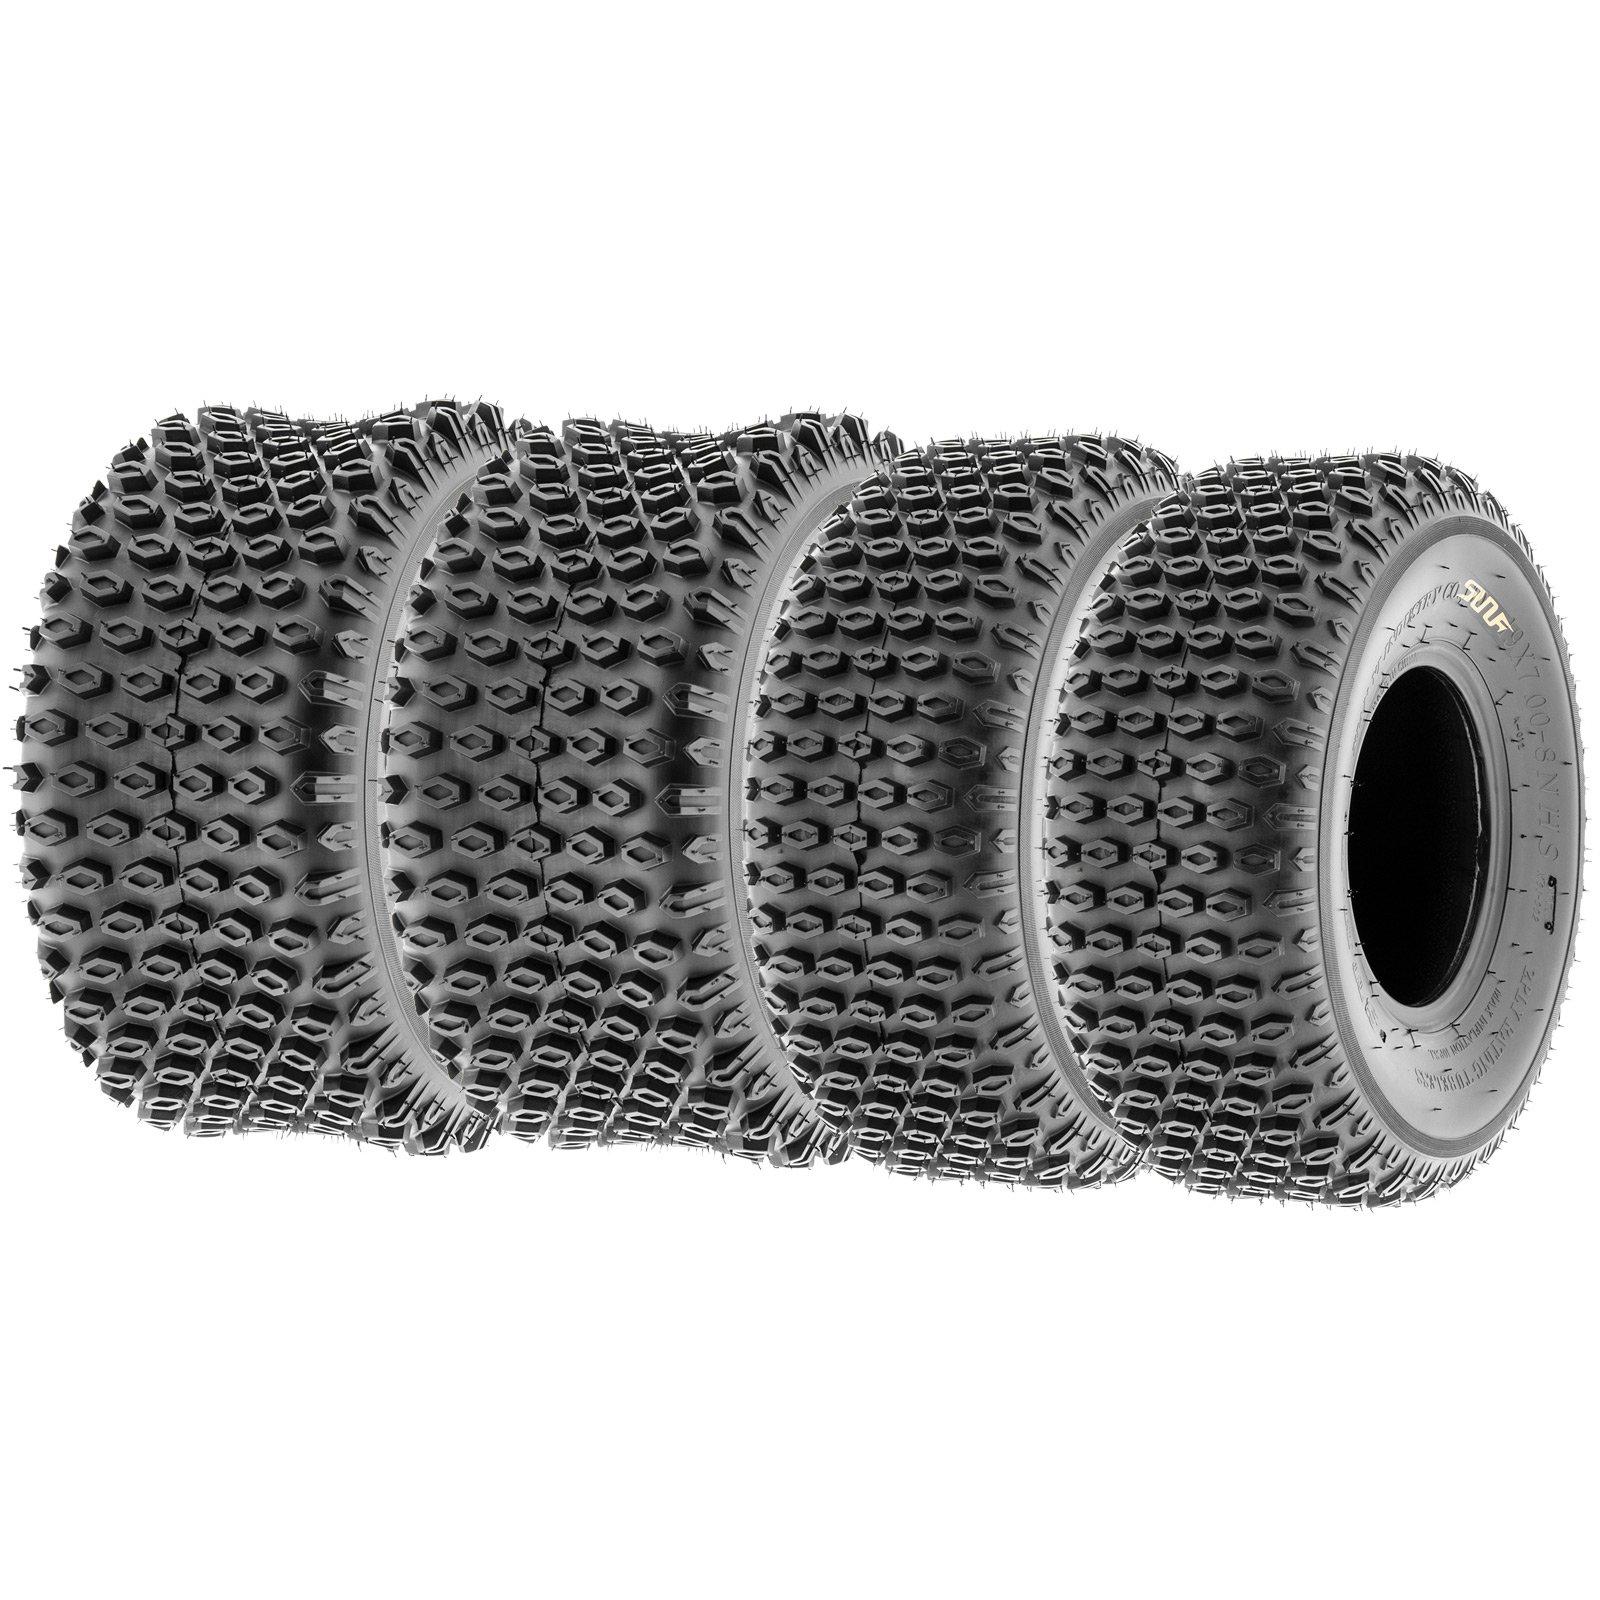 SunF Quad ATV Sport Tires 19x7-8 & 18x9.5-8 4 PR A012 (Full set of 4) by SunF